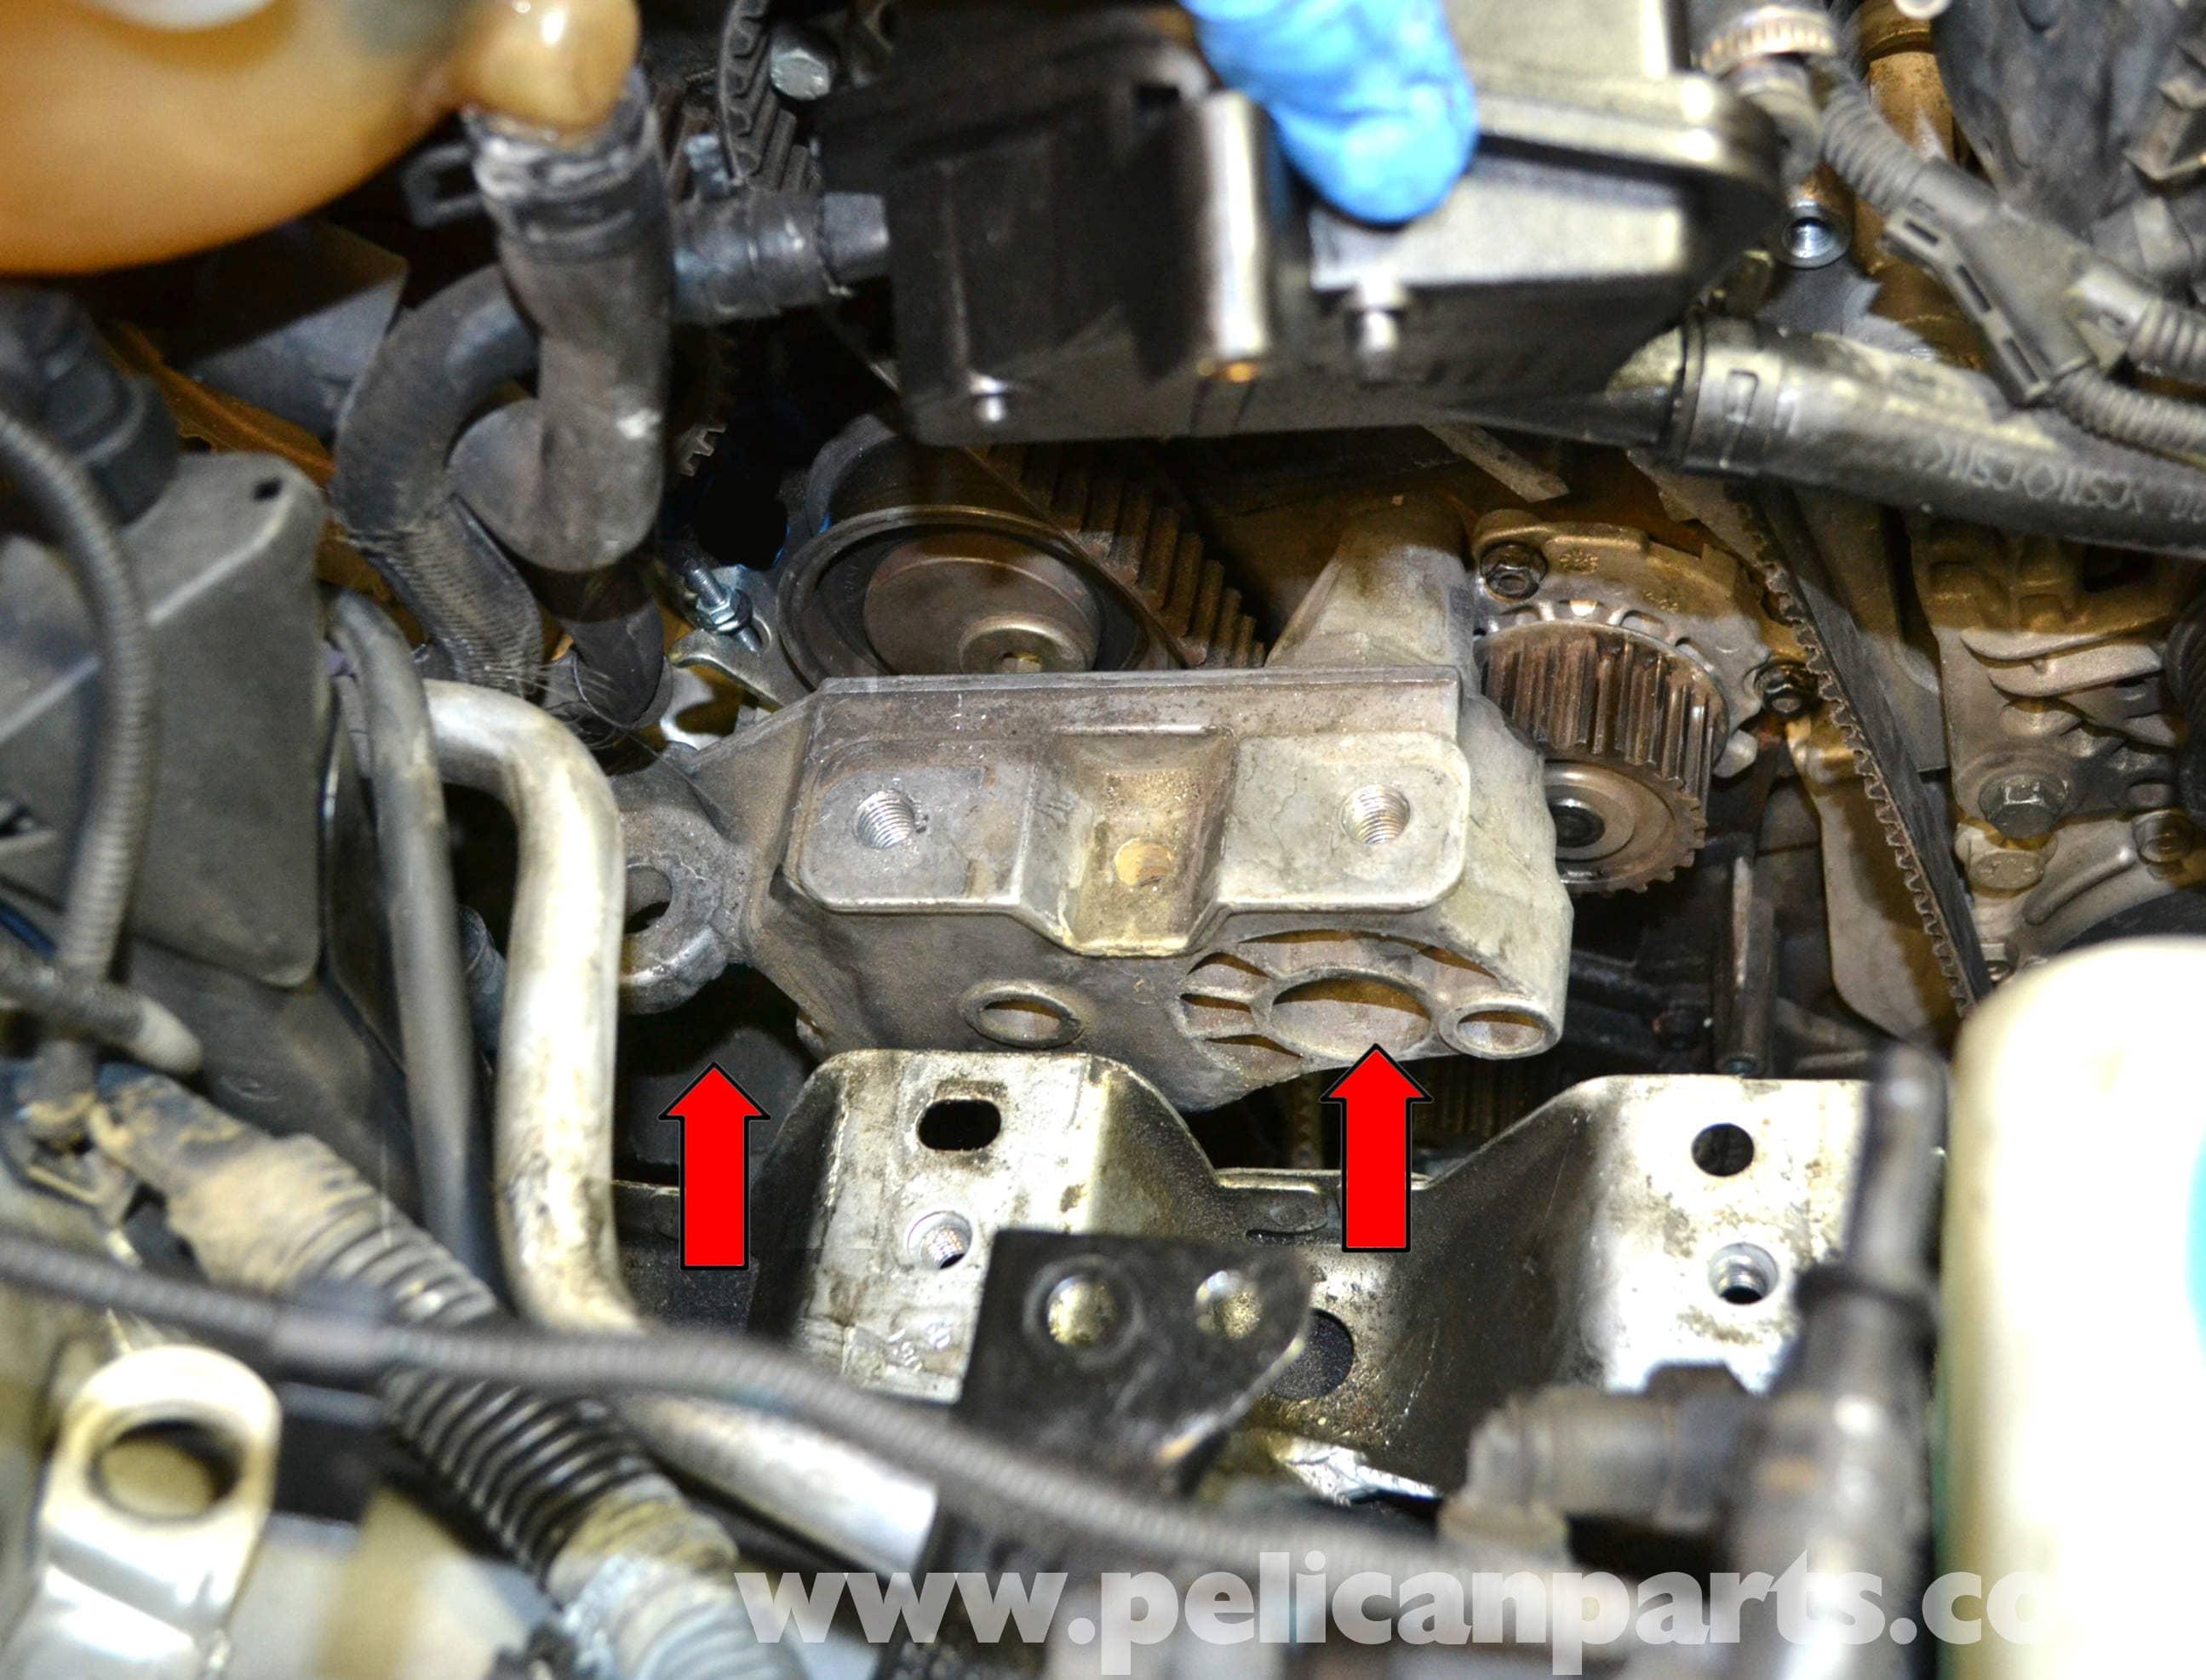 Volkswagen Golf GTI Mk IV Engine Mount Replacement (1999-2005) - Pelican  Parts DIY Maintenance Article | Vr6 Engine Diagram Engine Mount |  | Pelican Parts